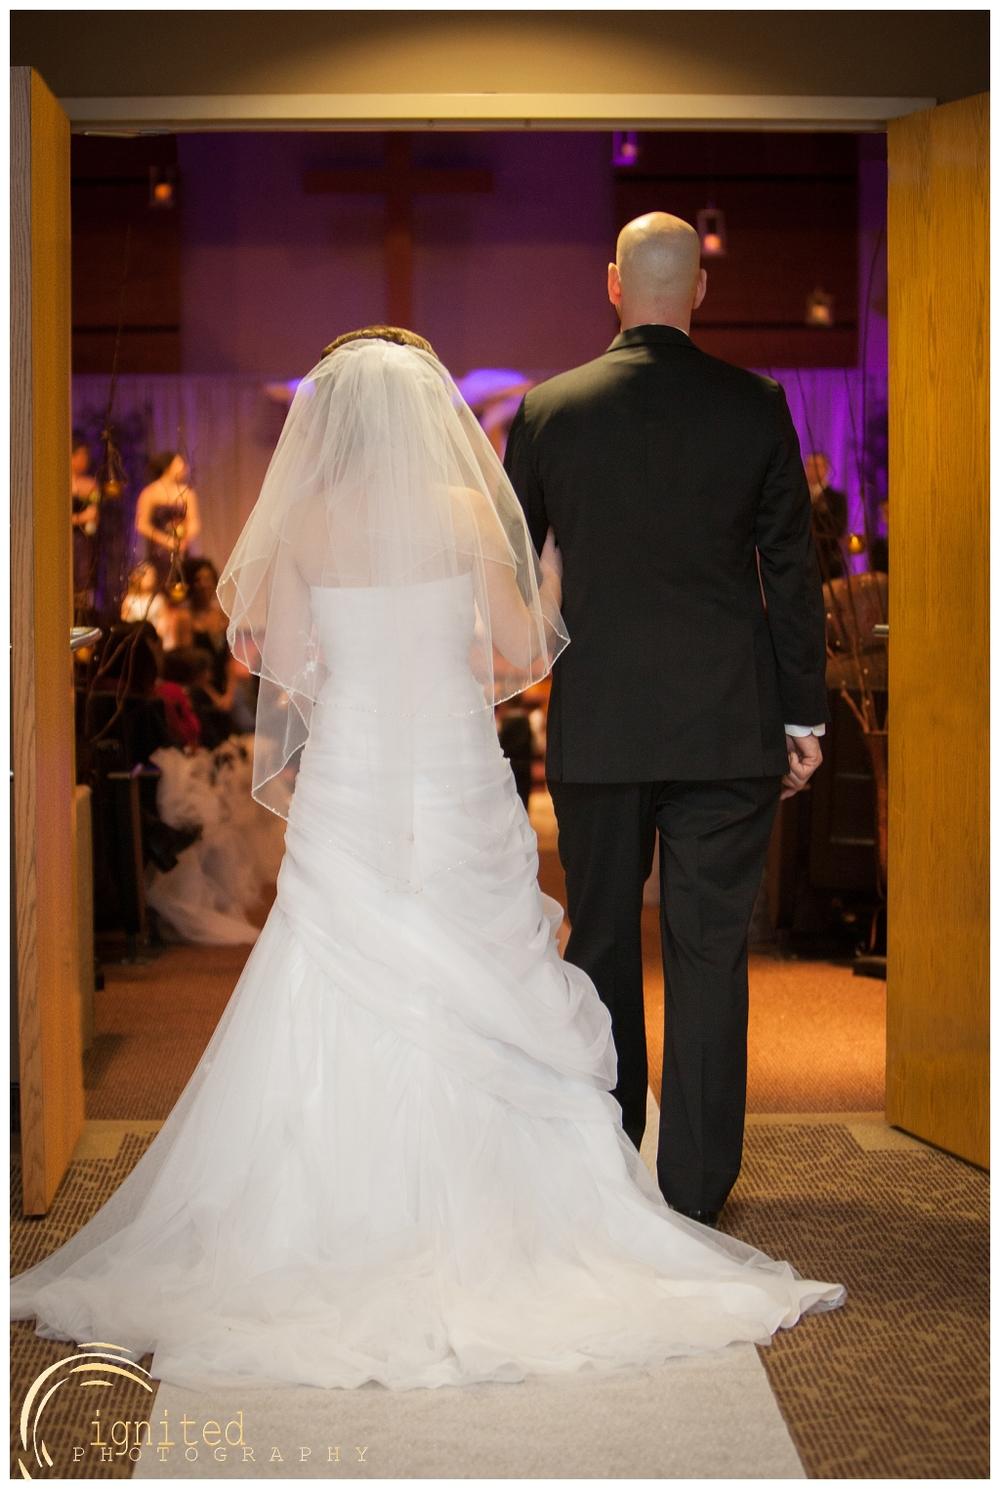 ignited Photography Alyssa  Castwell and Caleb Merna Wedding Brighton Nazarene The Naz Howell MI_0030.jpg